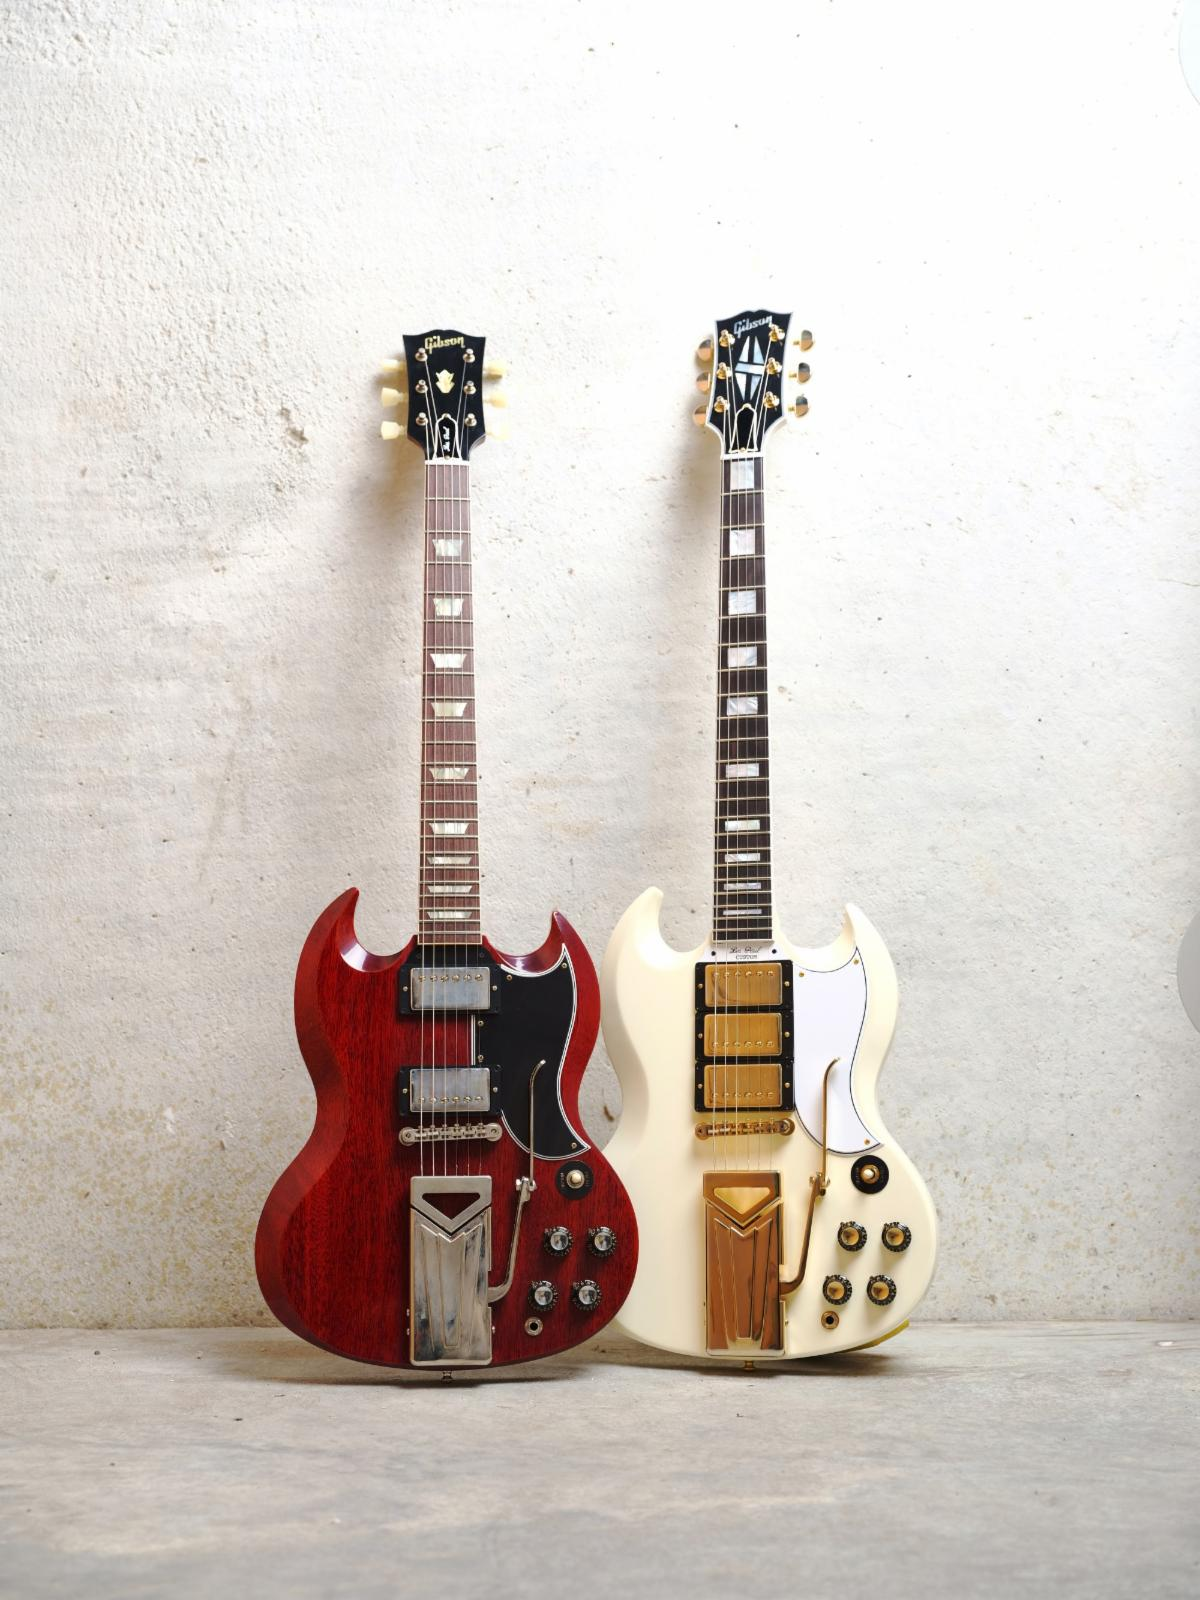 Gibson 60th Anniversary 1961 SG Standard Sideways Vibrola Cherry Red VOS Classic White VOS